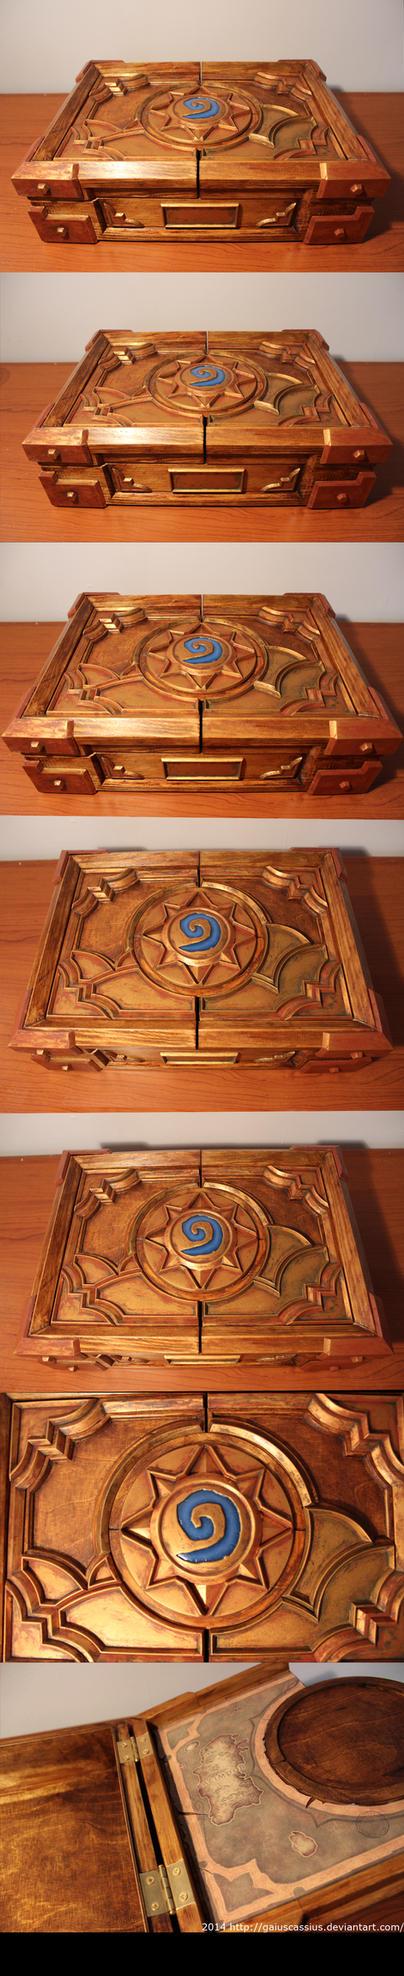 Hearthstone Box replica by CassiusProps